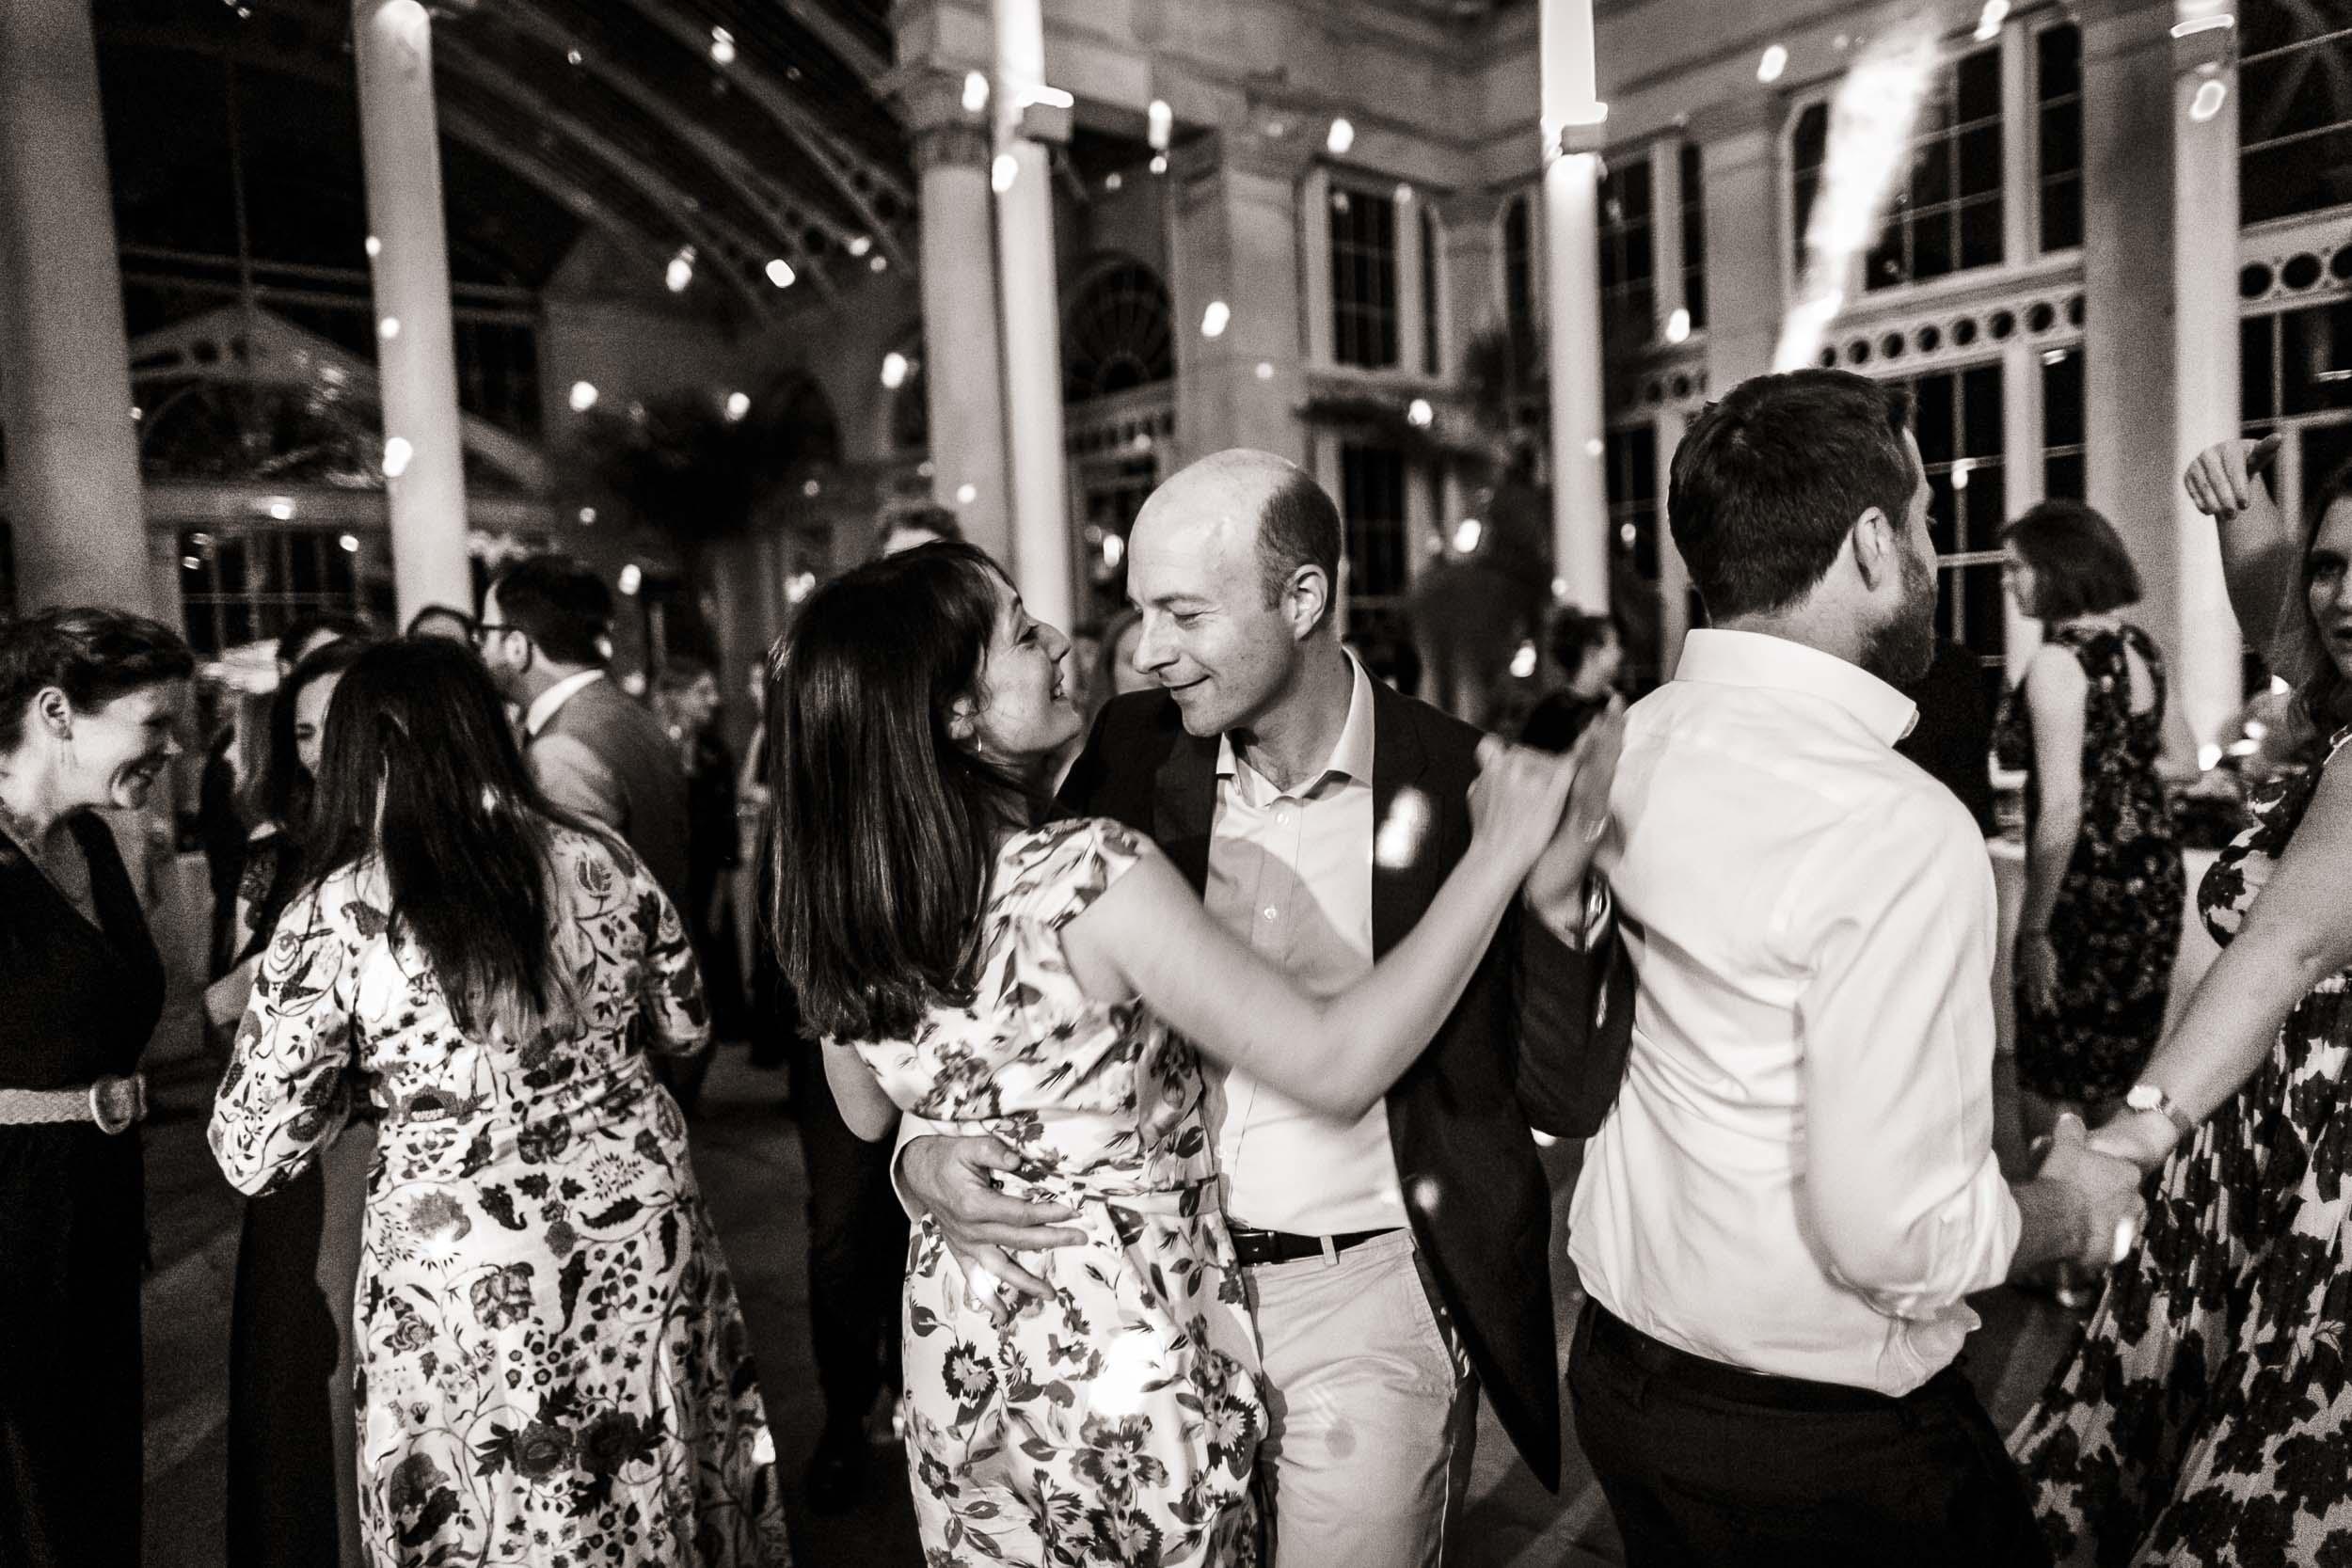 syon-house-wedding-photographer-london 173.jpg